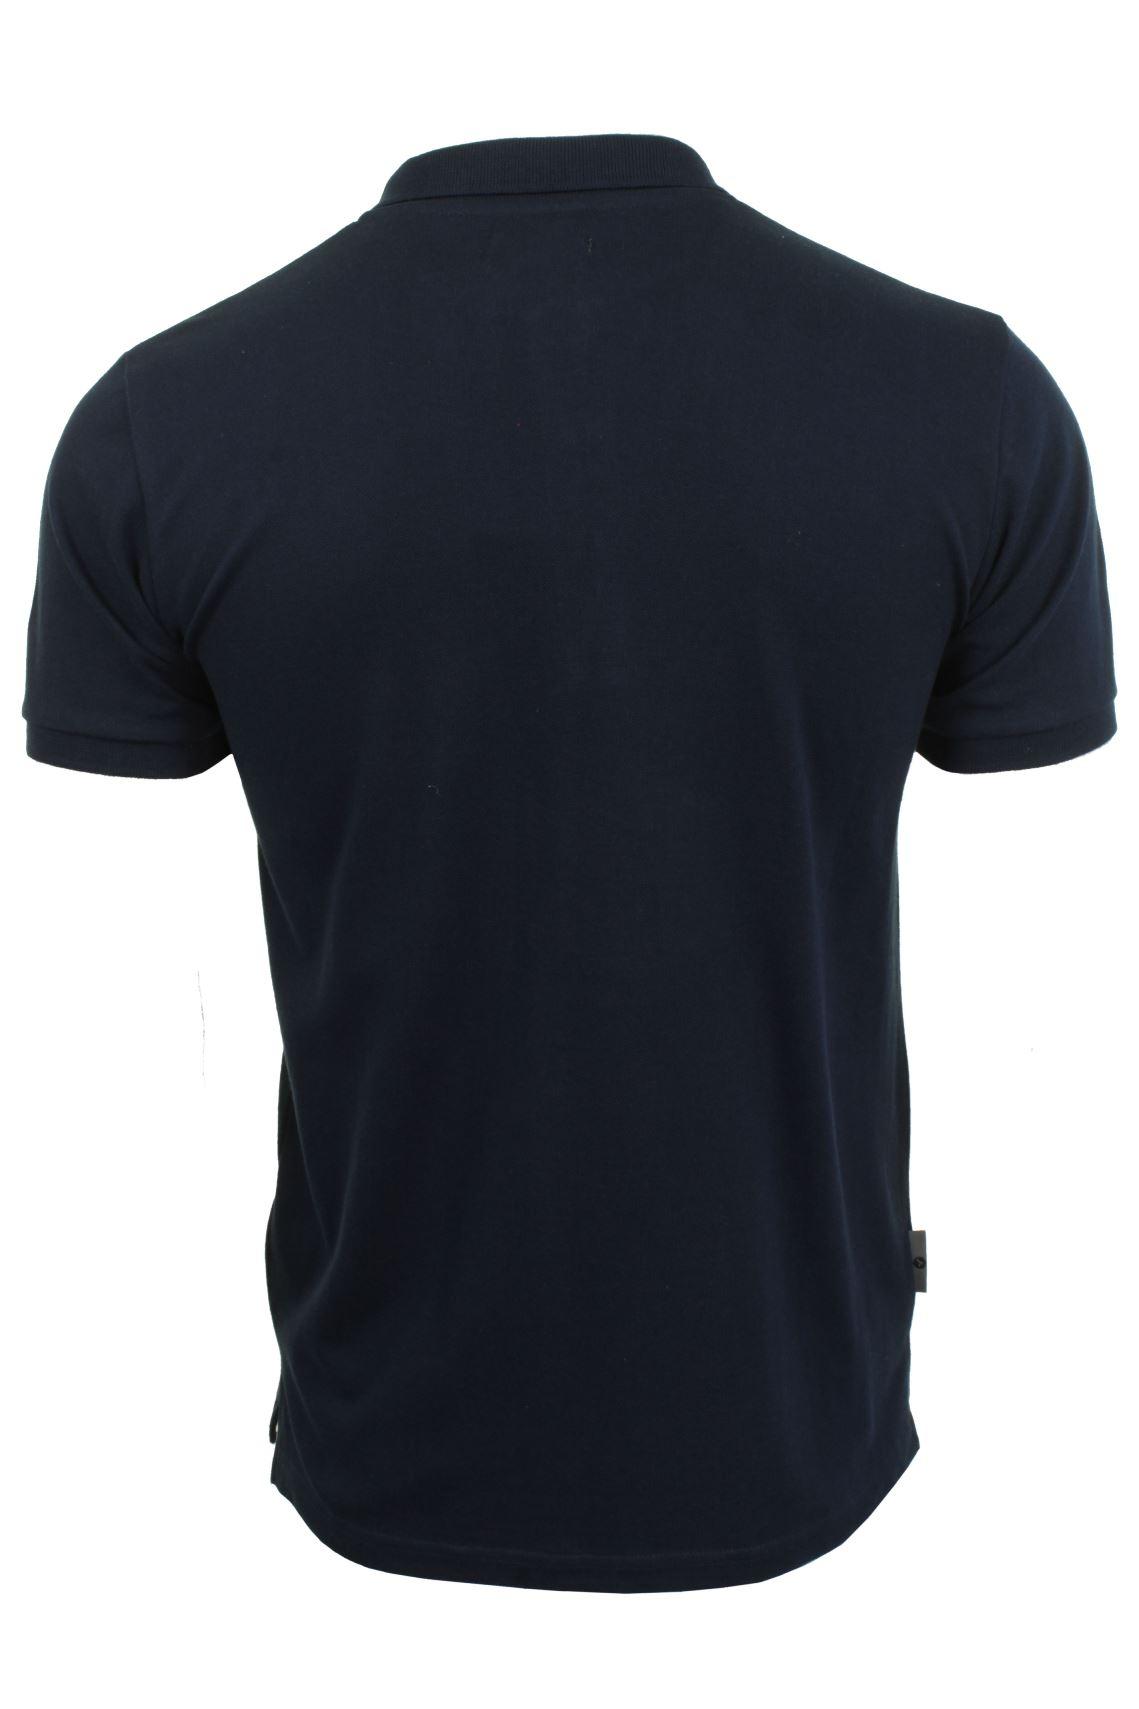 Voi-Jeans-Mens-Fashion-Polo-Shirt-Redford-Short-Sleeved thumbnail 5